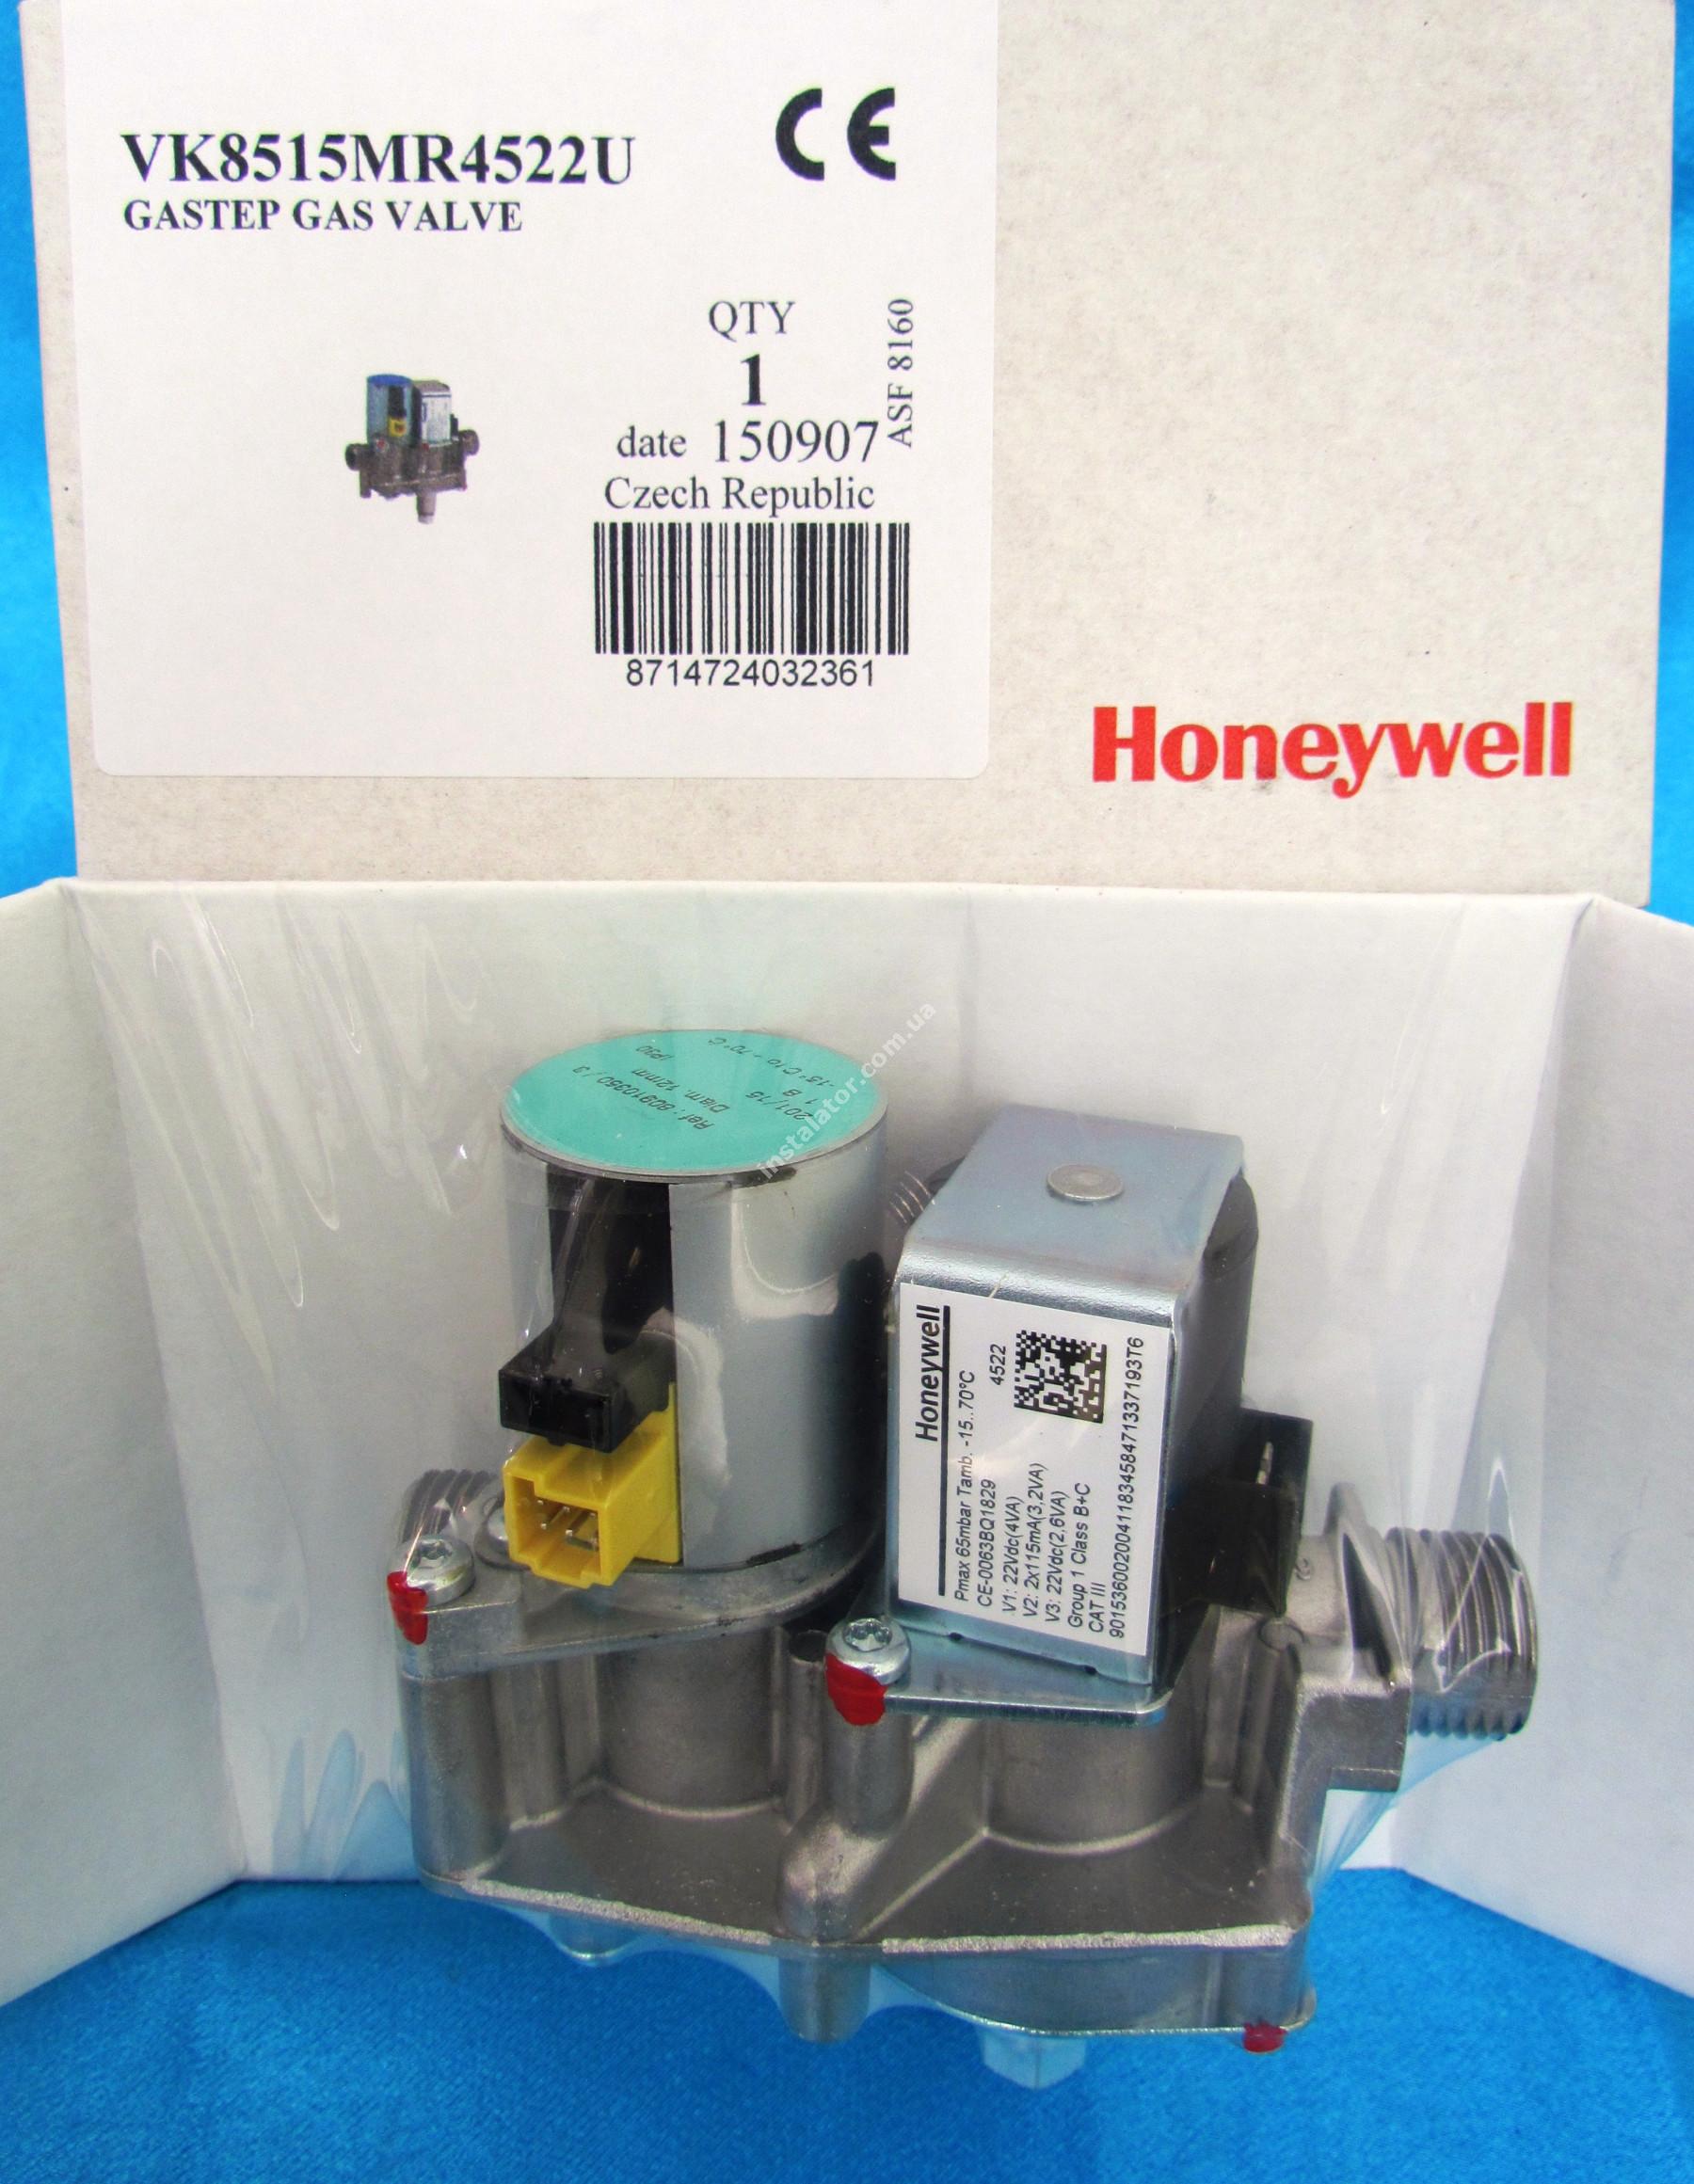 0020049296 Газовый клапан с регулятором PROTHERM/VAILLANT/SAUNIAR DUVAL/ full-image-1